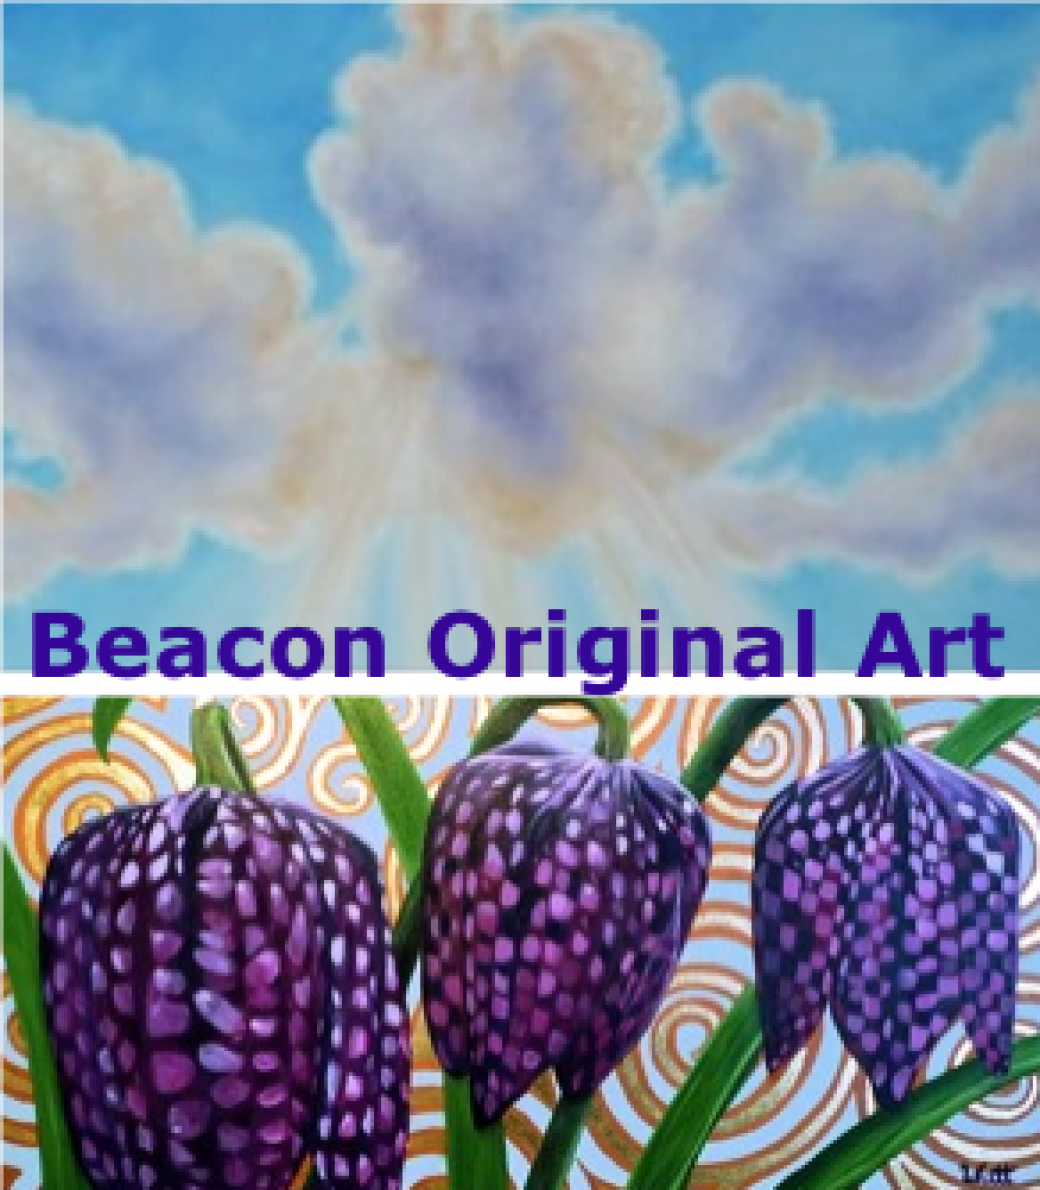 Beacon Original Art Spring Exhibition and Sale